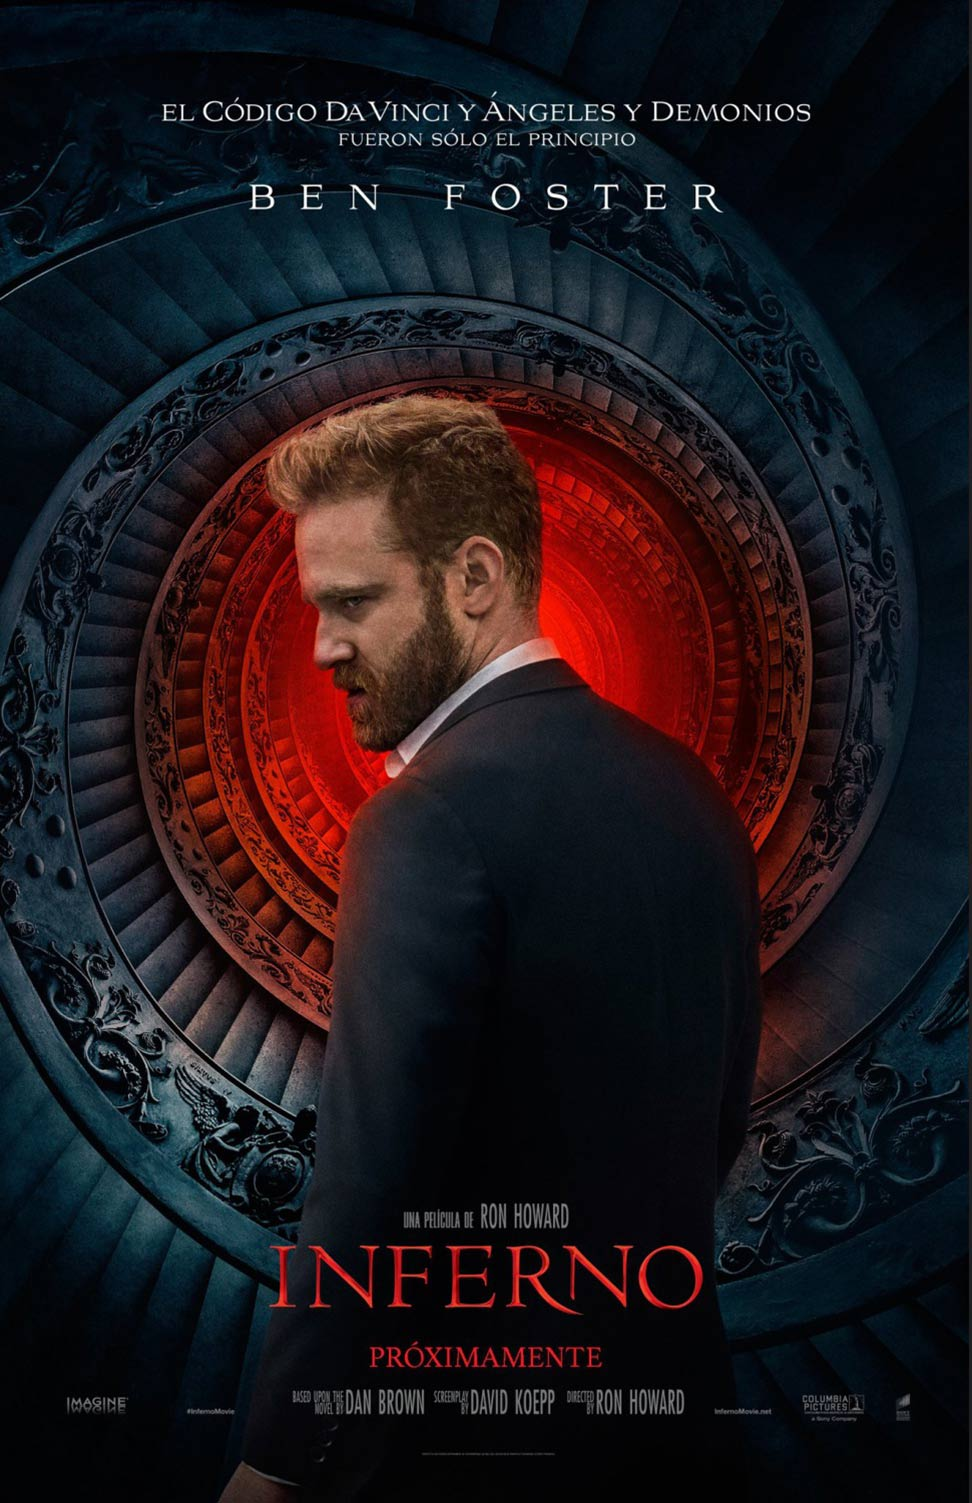 Inferno 2016 Poster 4 Trailer Addict